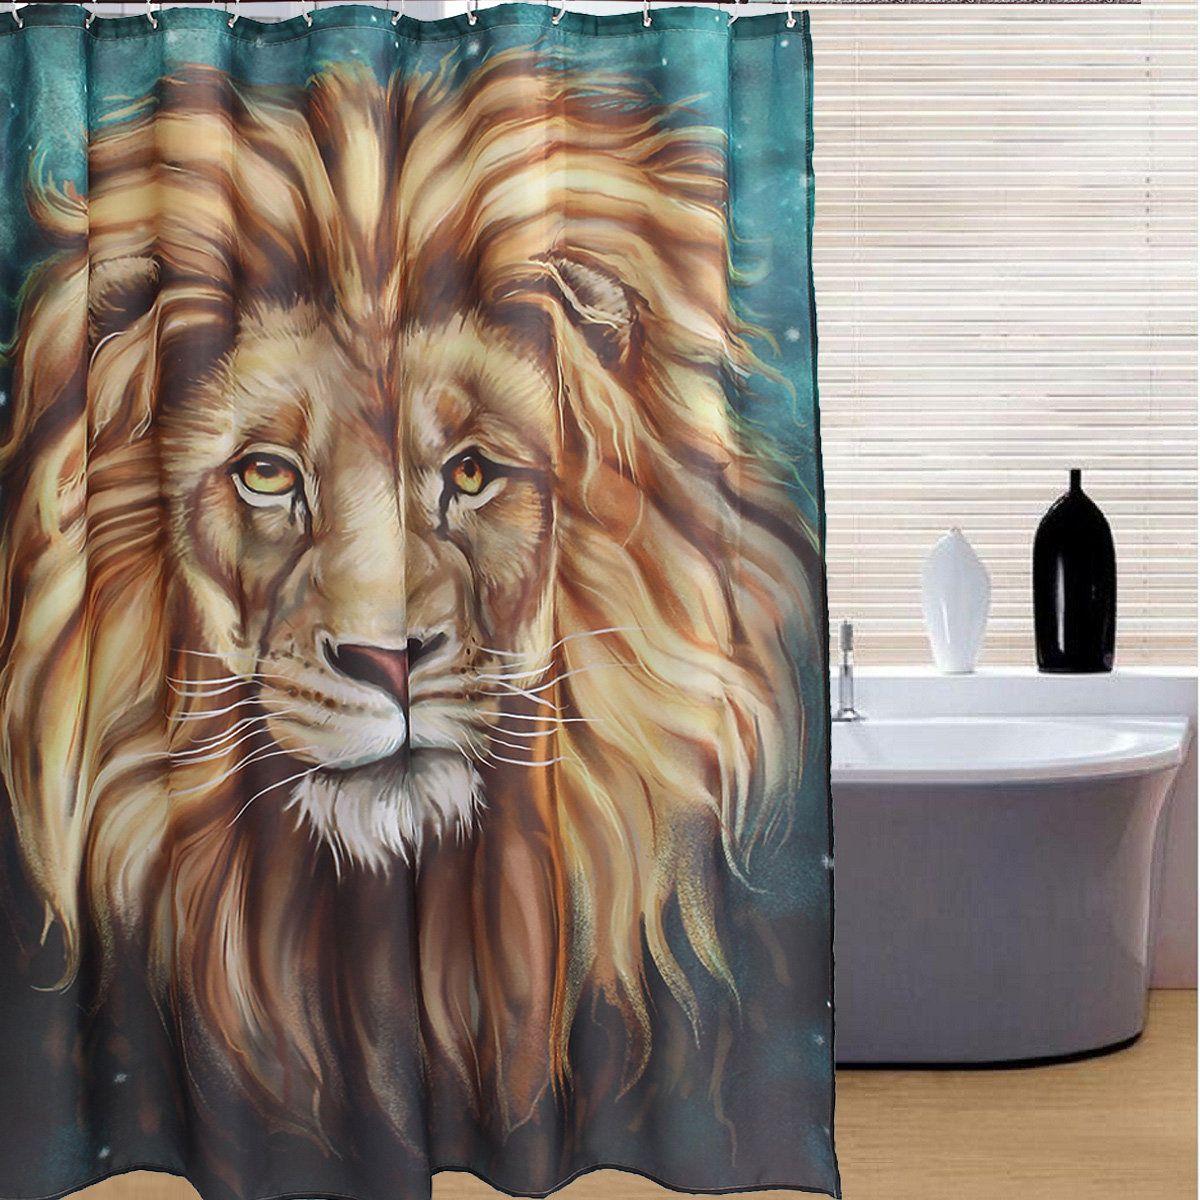 Lion Head Style Bathroom Shower Curtain With 12 Hooks Panel Fabric